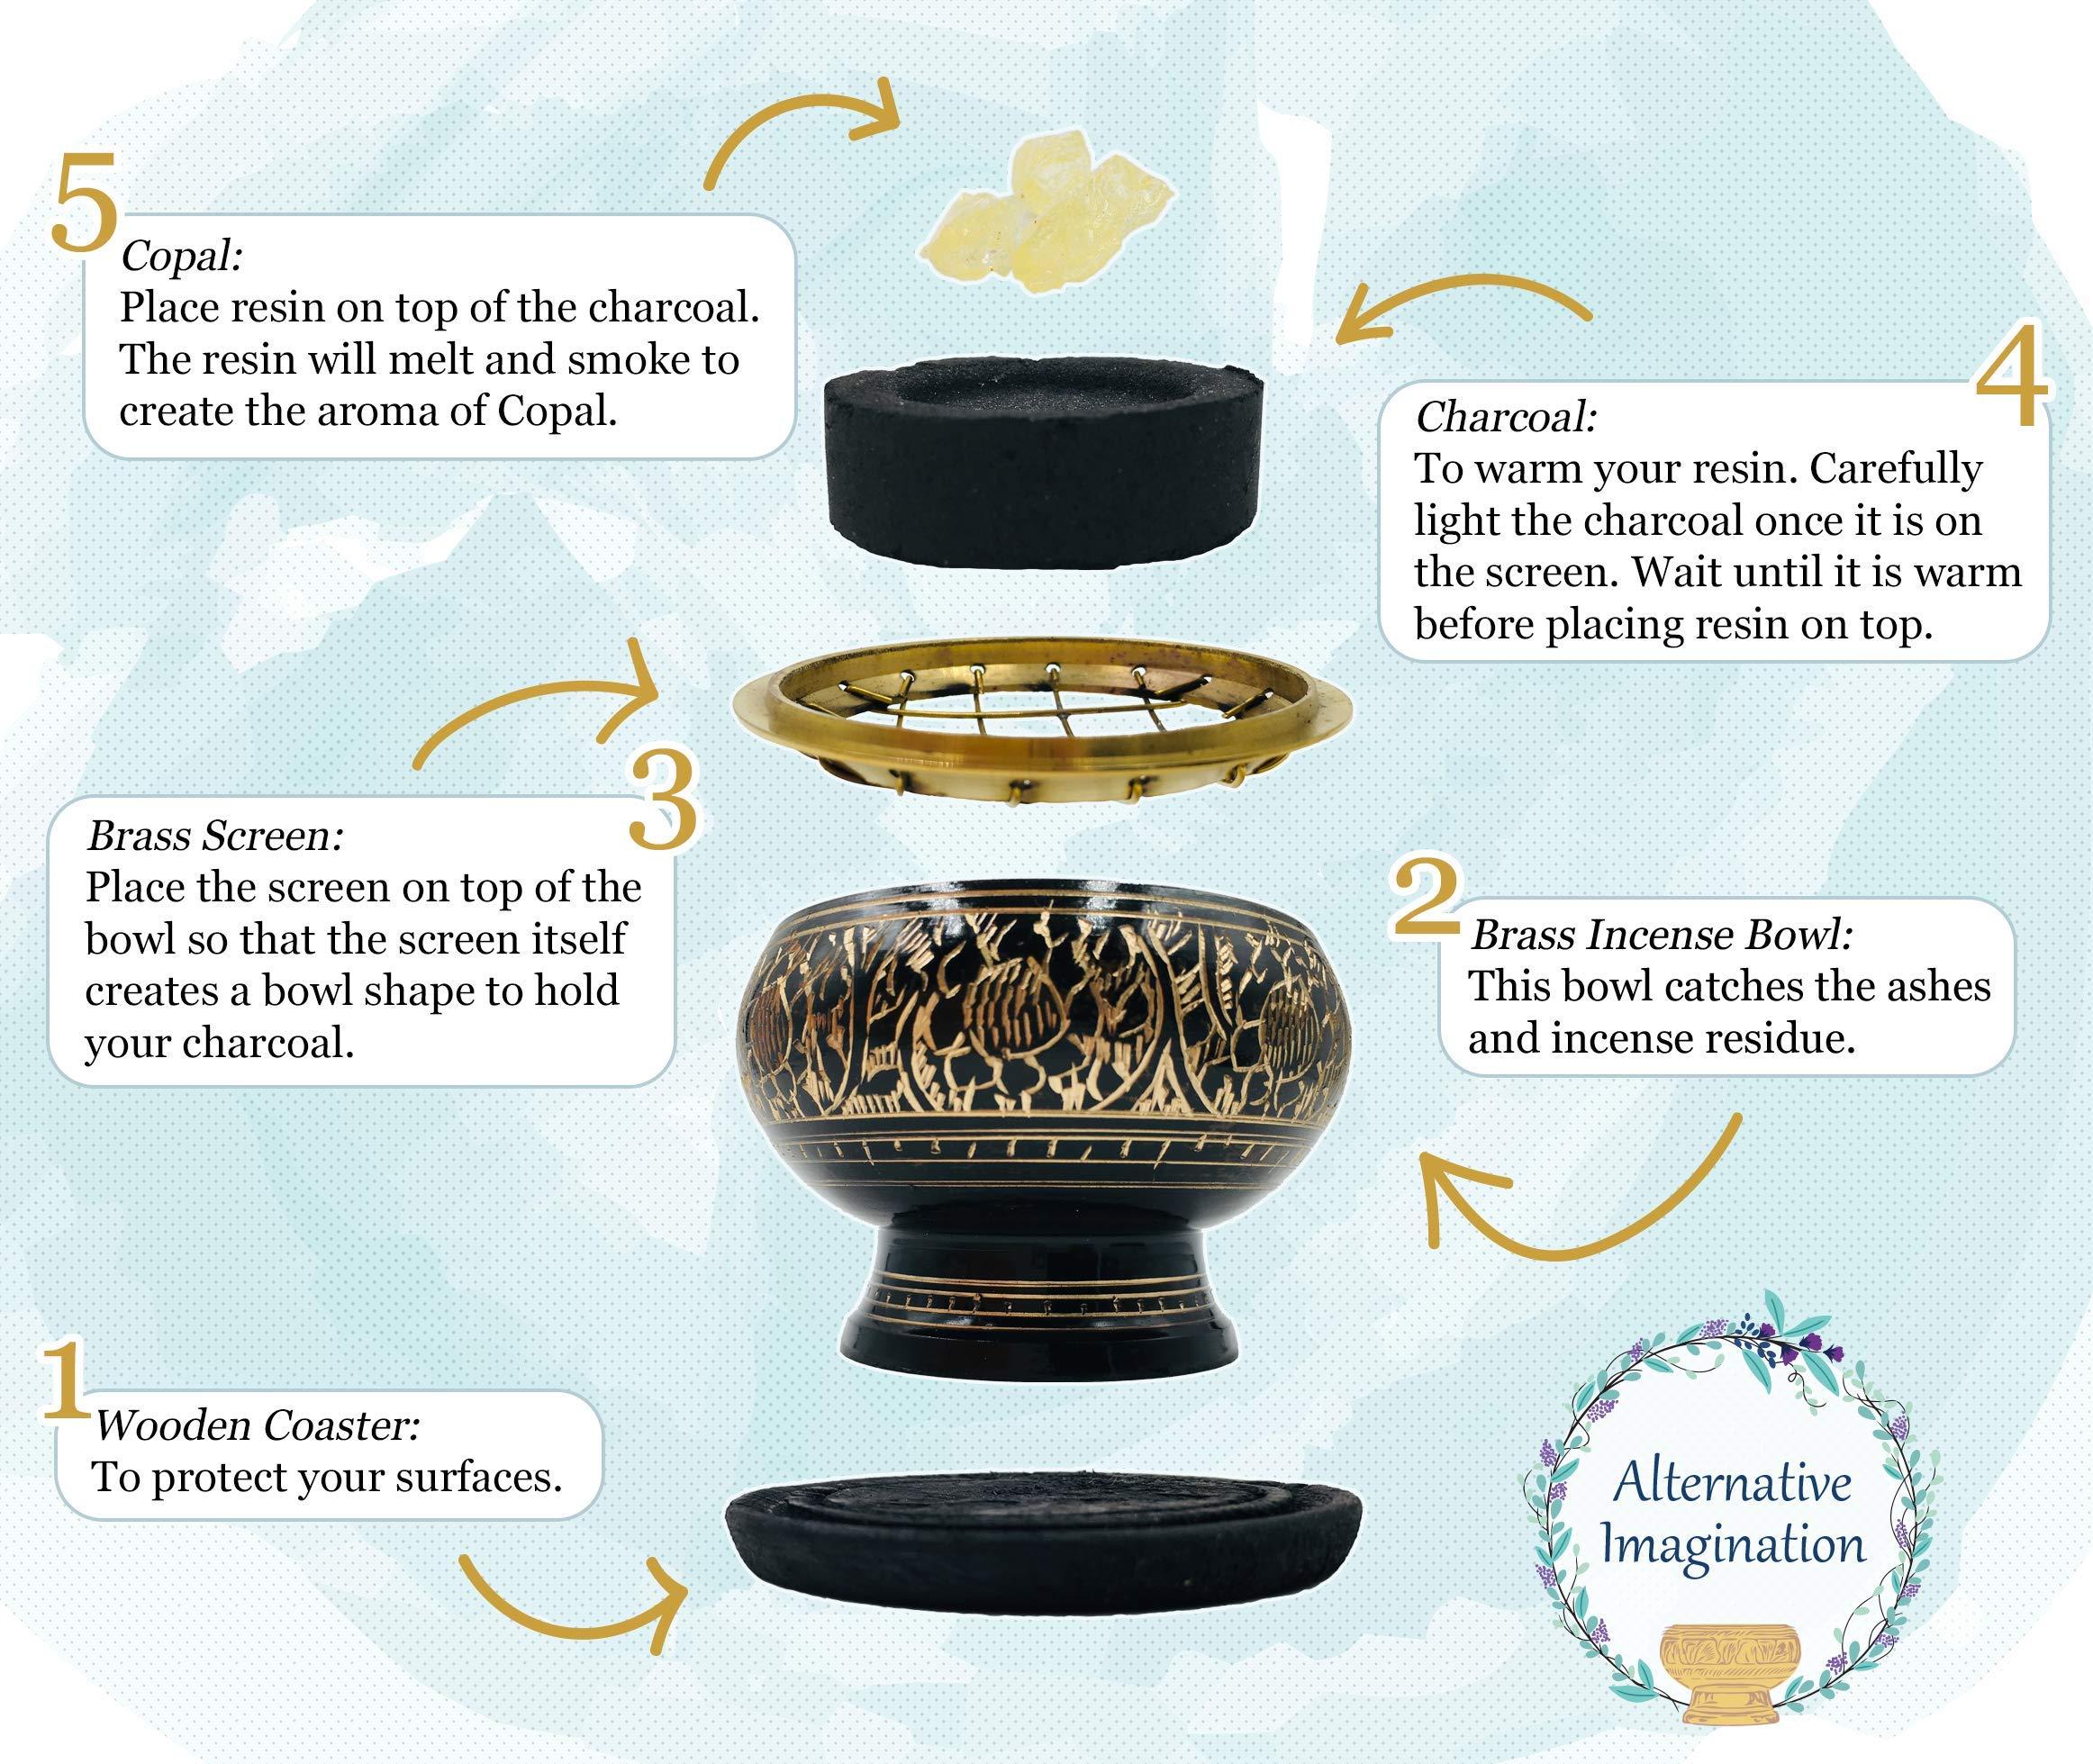 Alternative Imagination Premium Copal Burning Kit (with Tibetan Incense Burner or Brass Screen Burner) (Black Brass) by Alternative Imagination (Image #5)